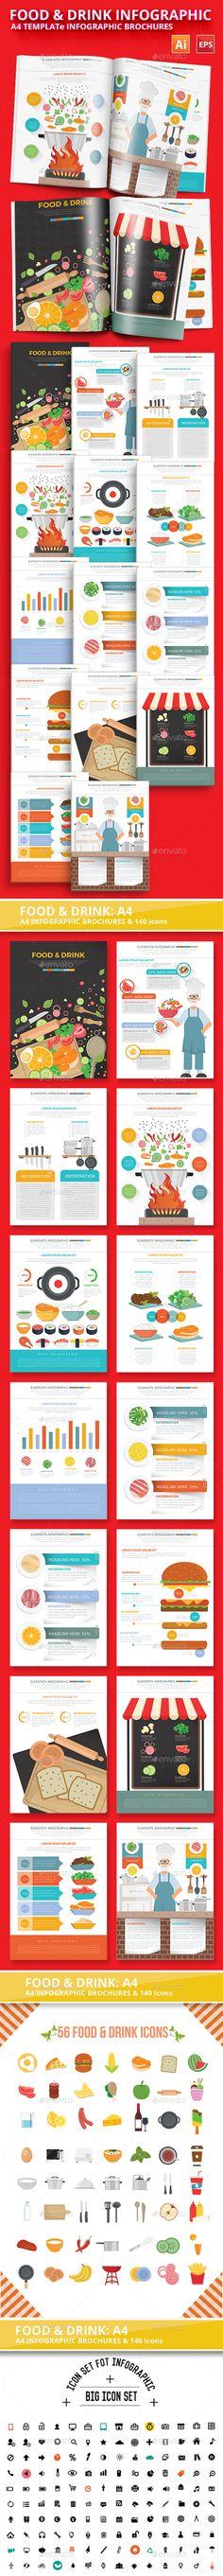 Food & Drink  infographic Design Template Vector EPS, AI Illustrator. Download here: https://graphicriver.net/item/food-drink-infographic-template-design/17676877?ref=ksioks